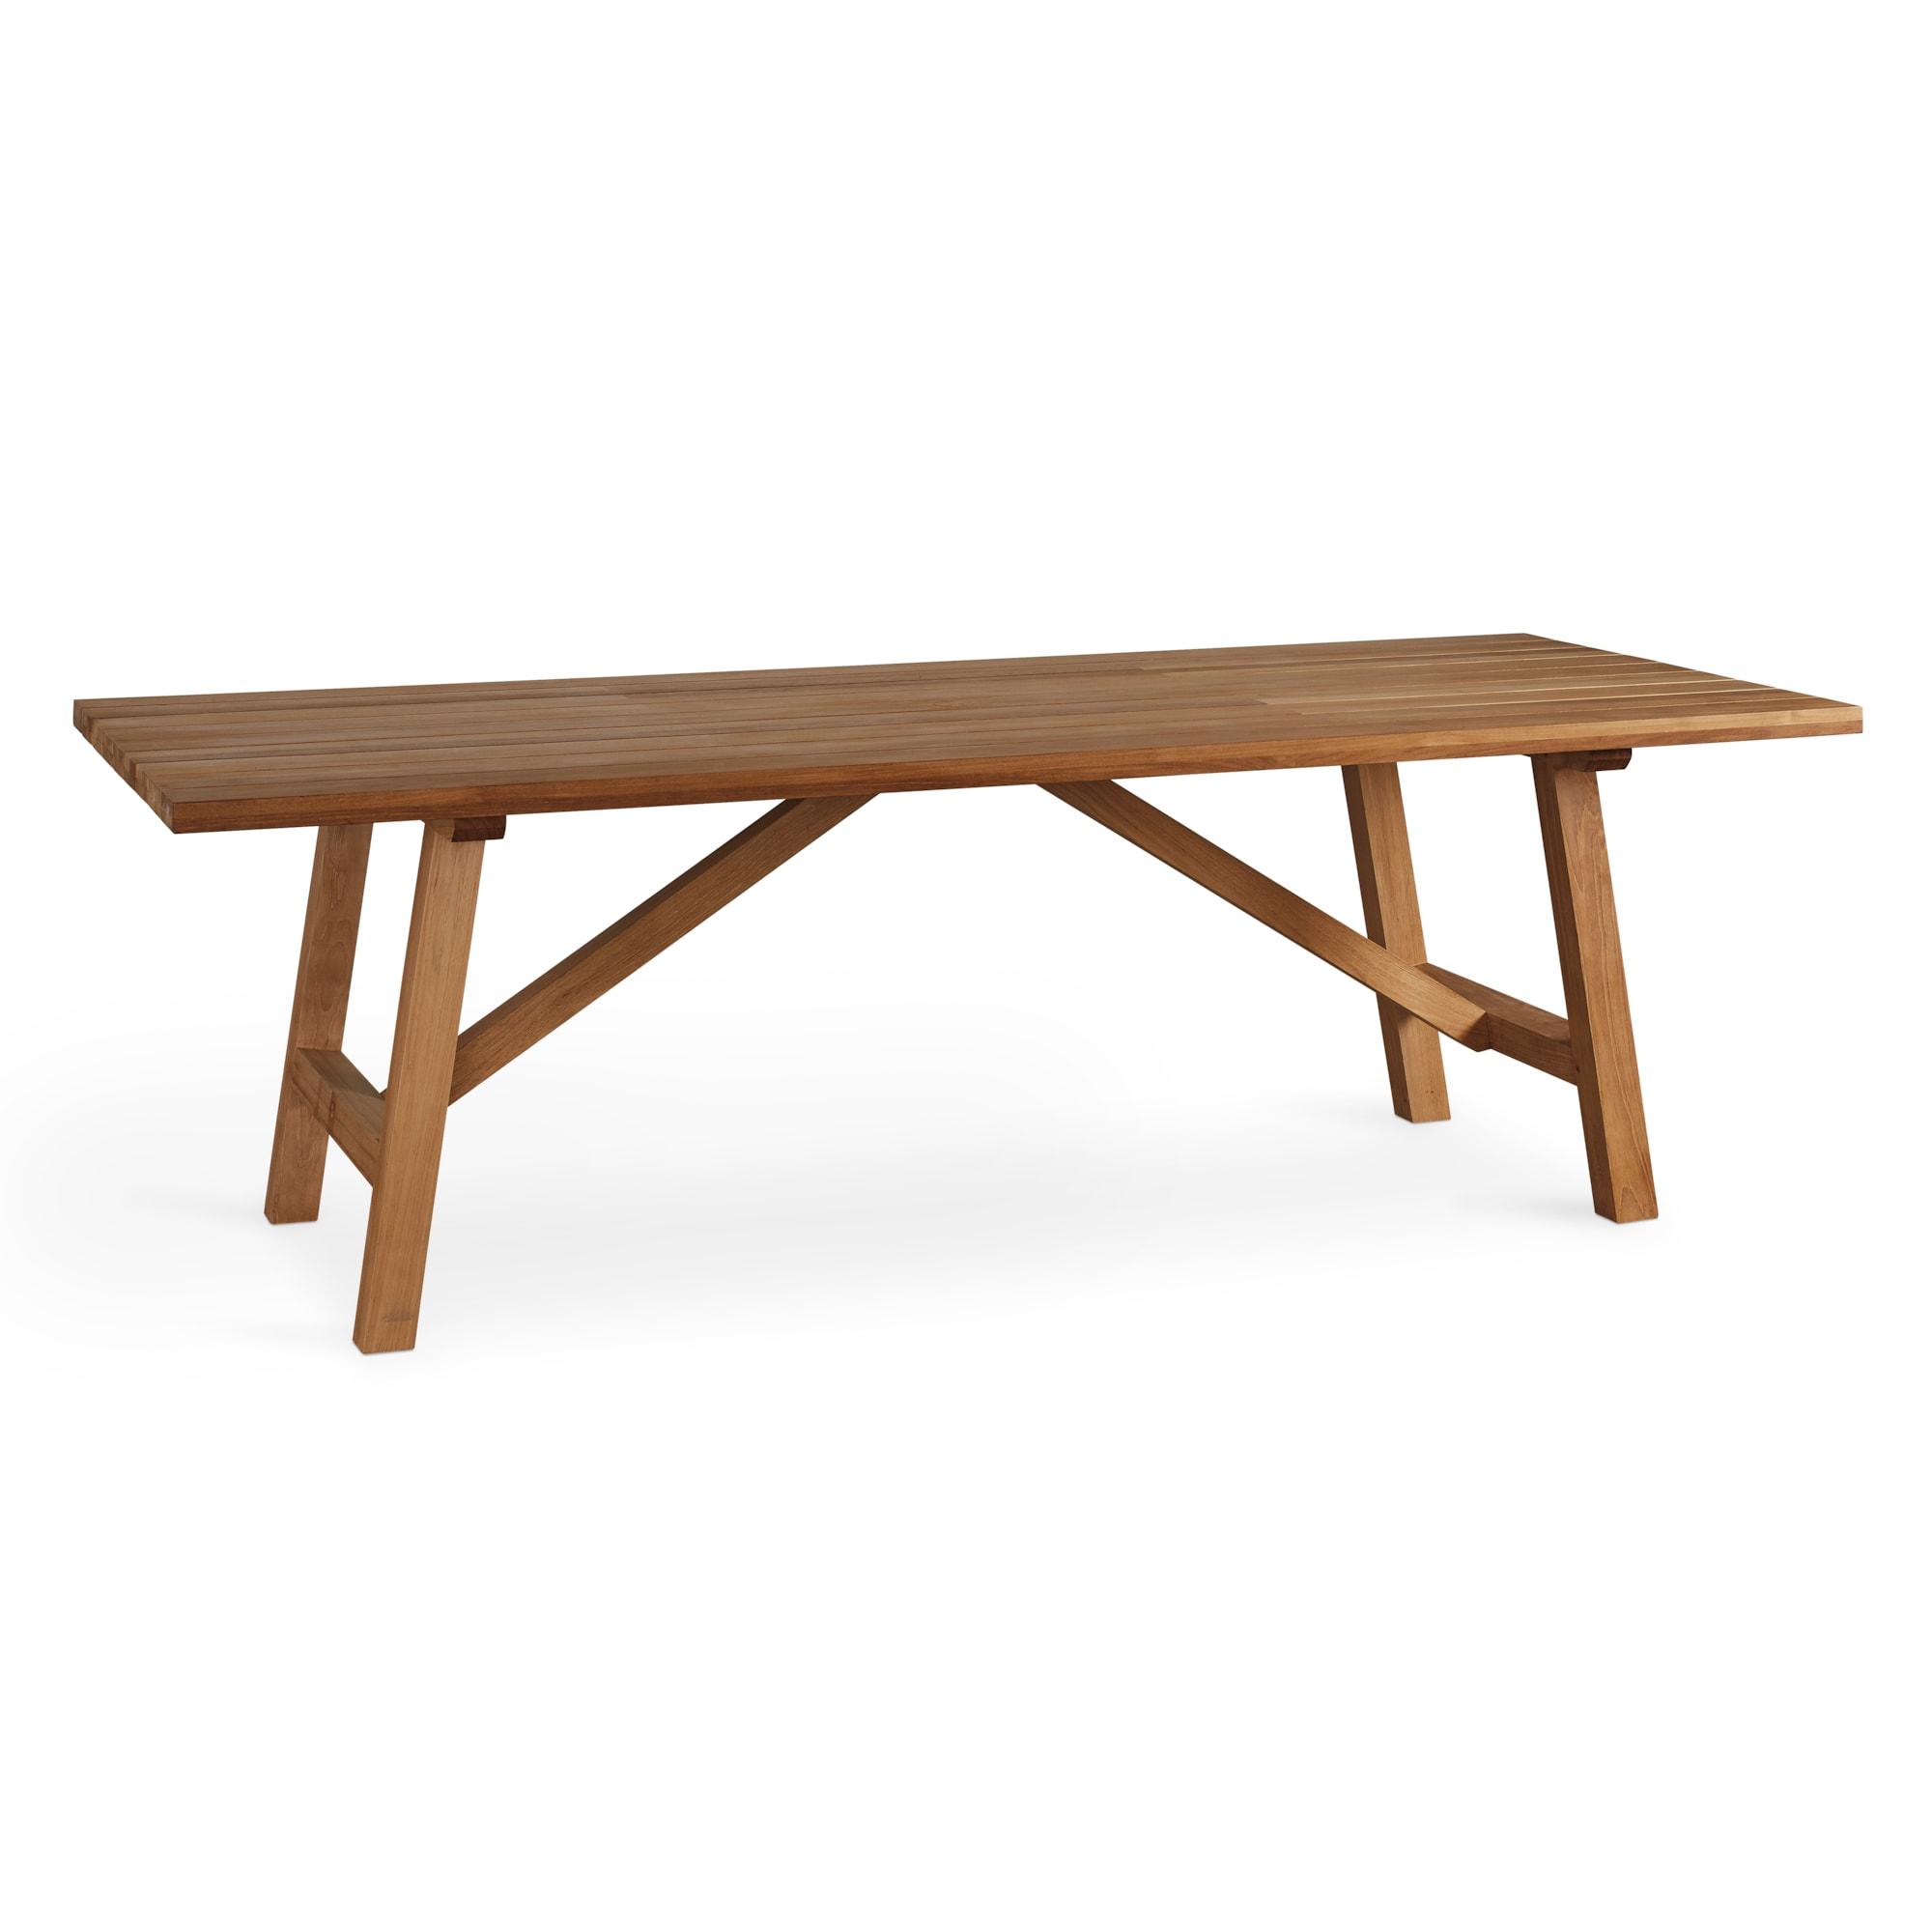 96 Inch Rectangular Dining Table Martin Teak Tables